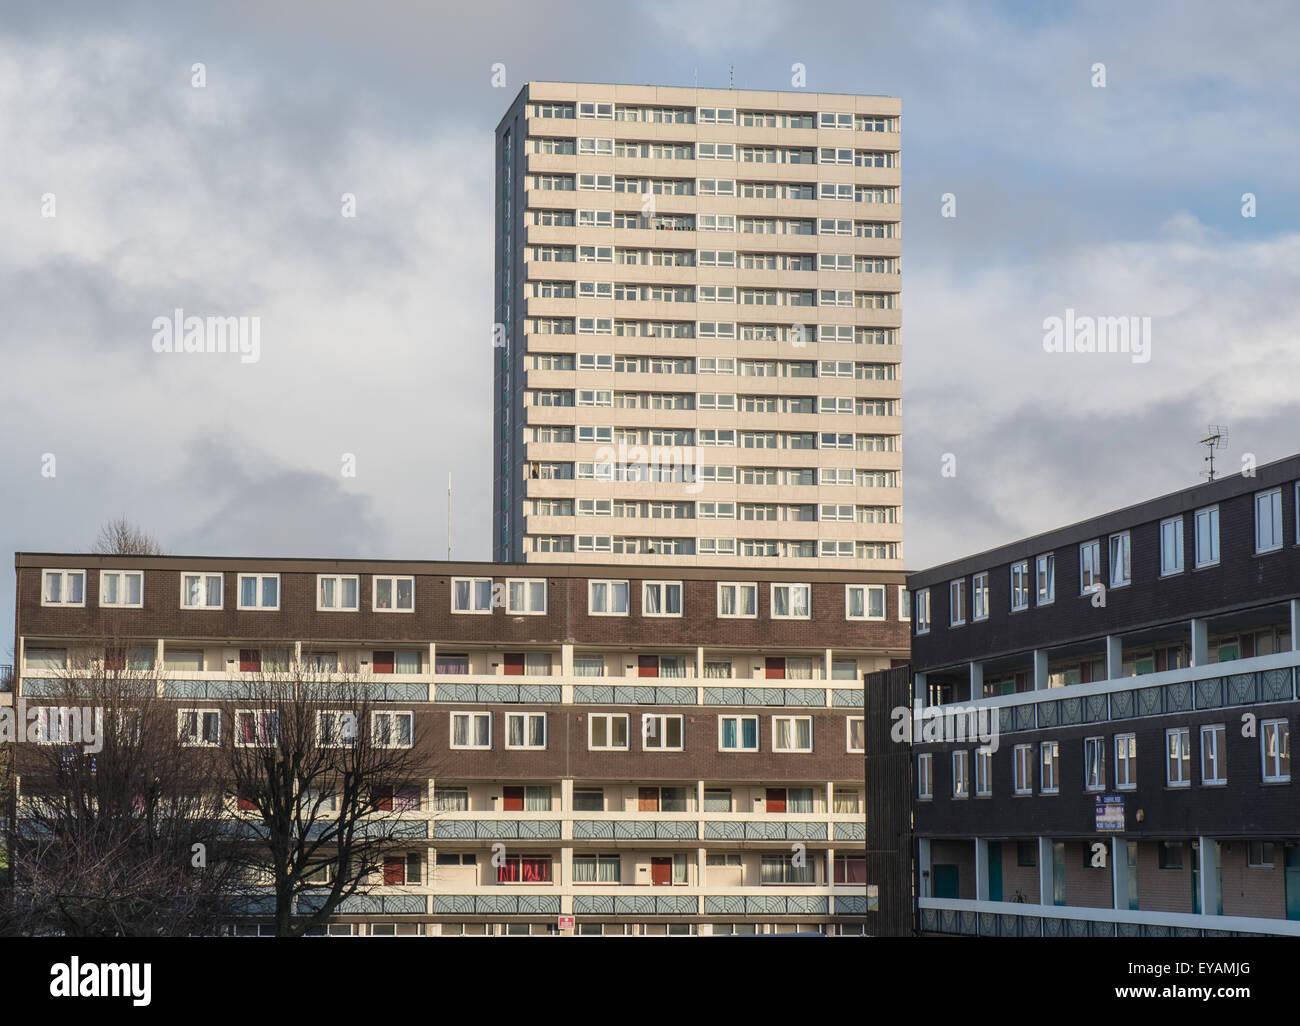 1960s housing estate - Stock Image